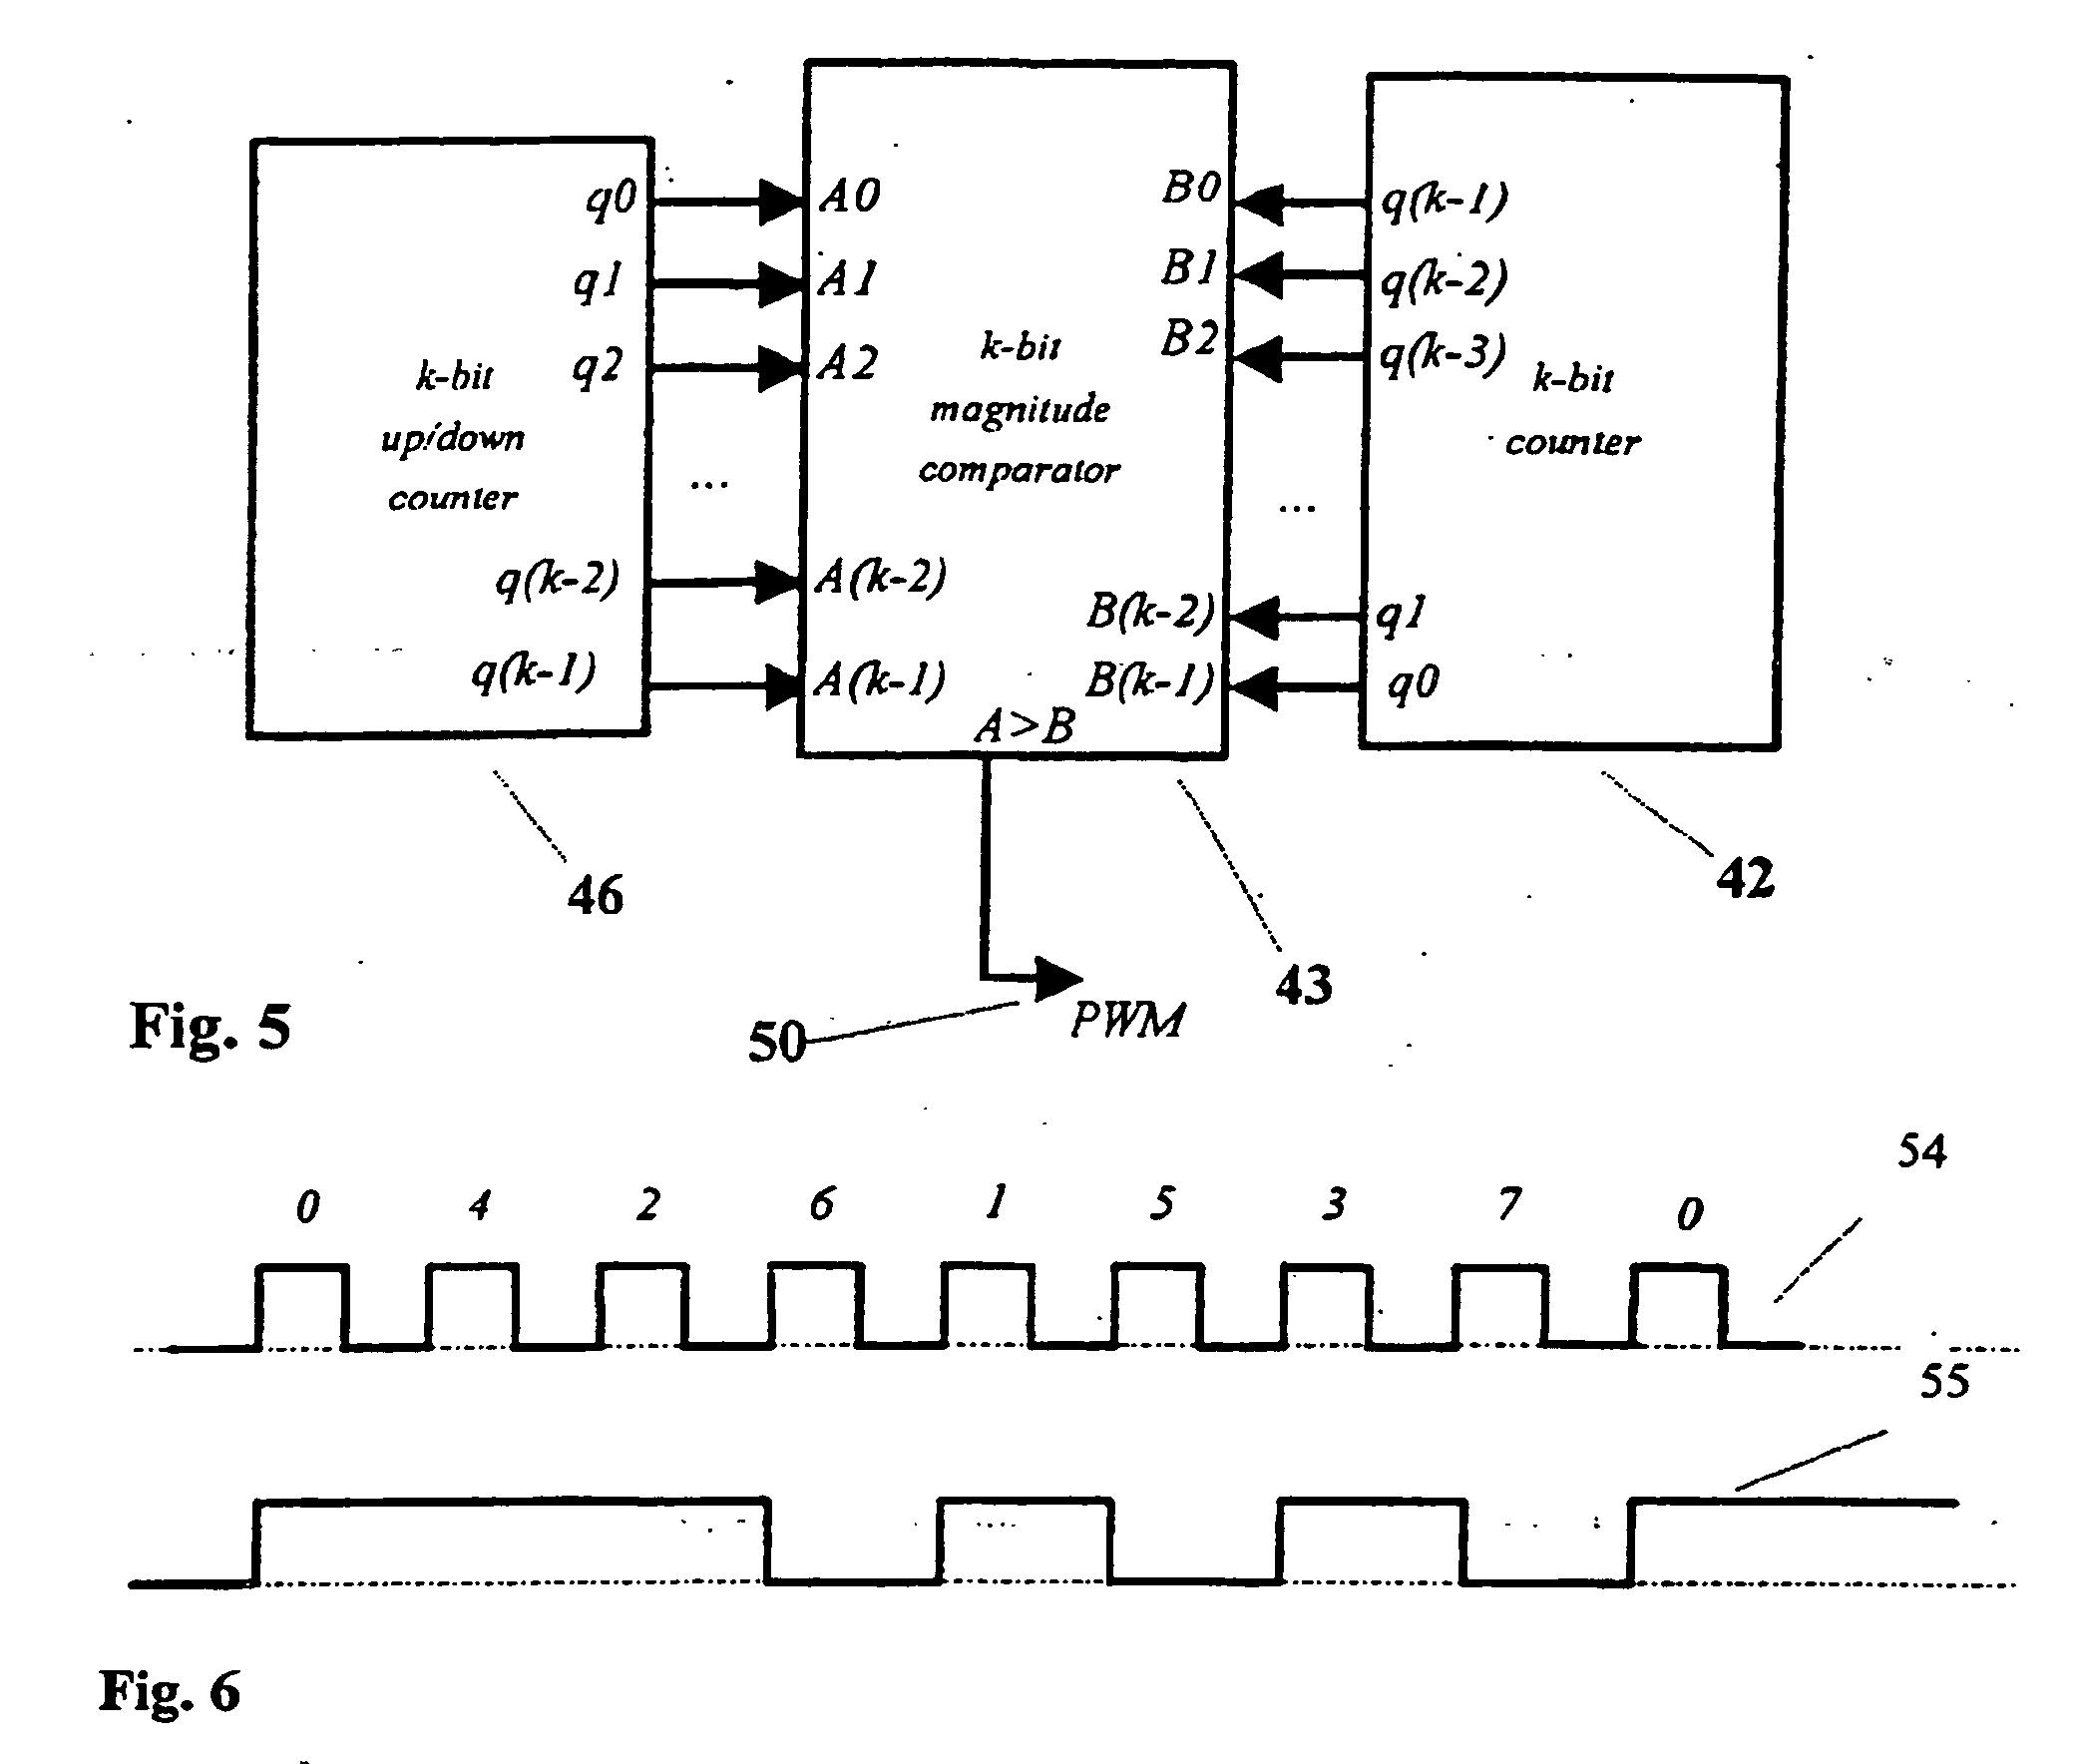 pulse width modulation electronics in meccano